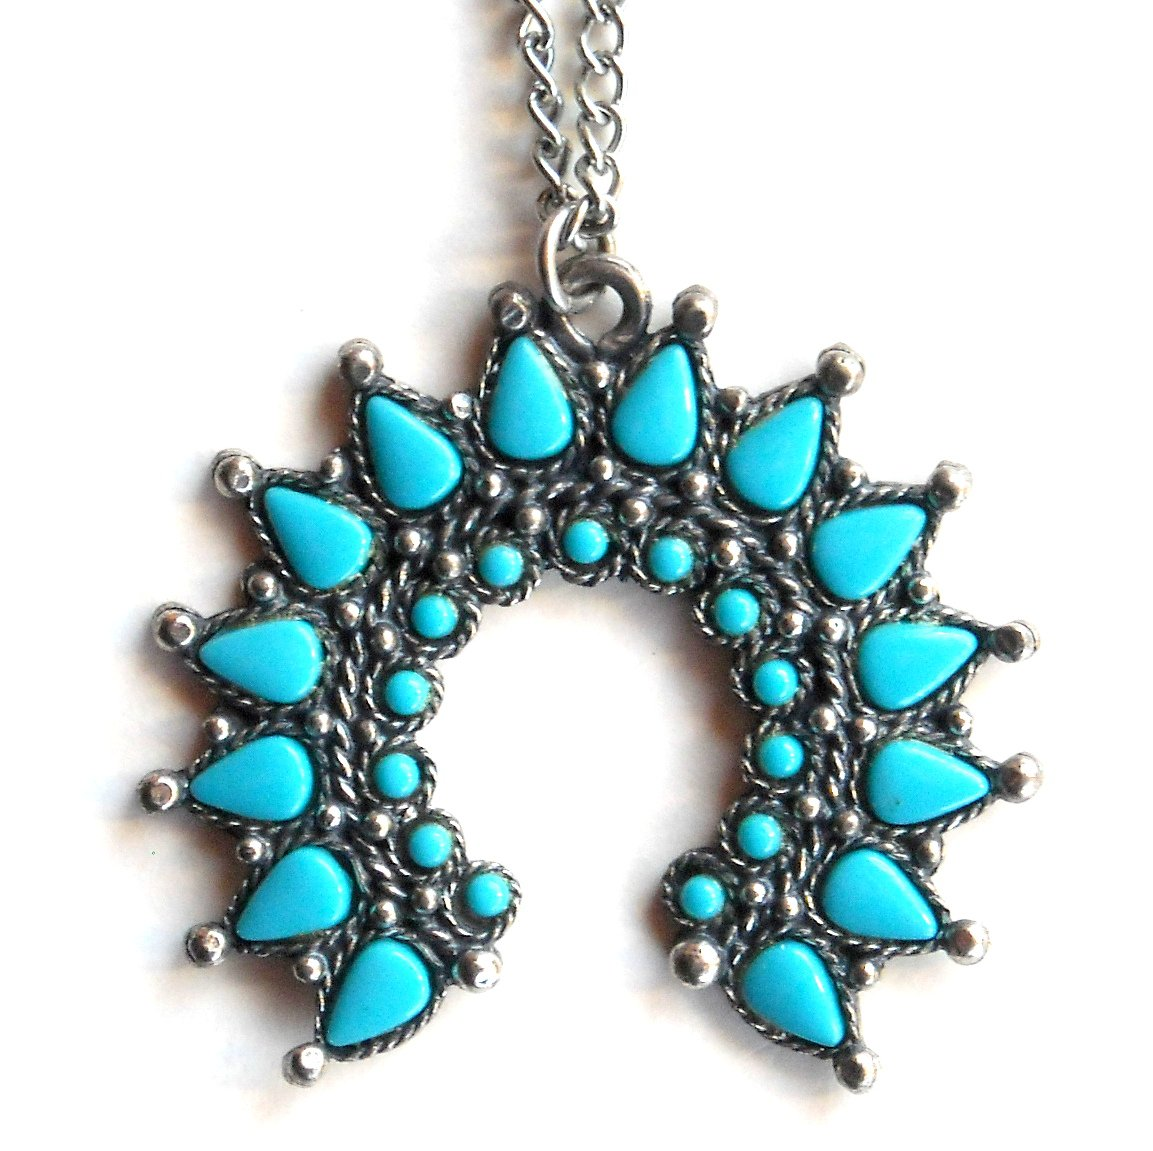 Vintage Florenta of California Native American Design Necklace